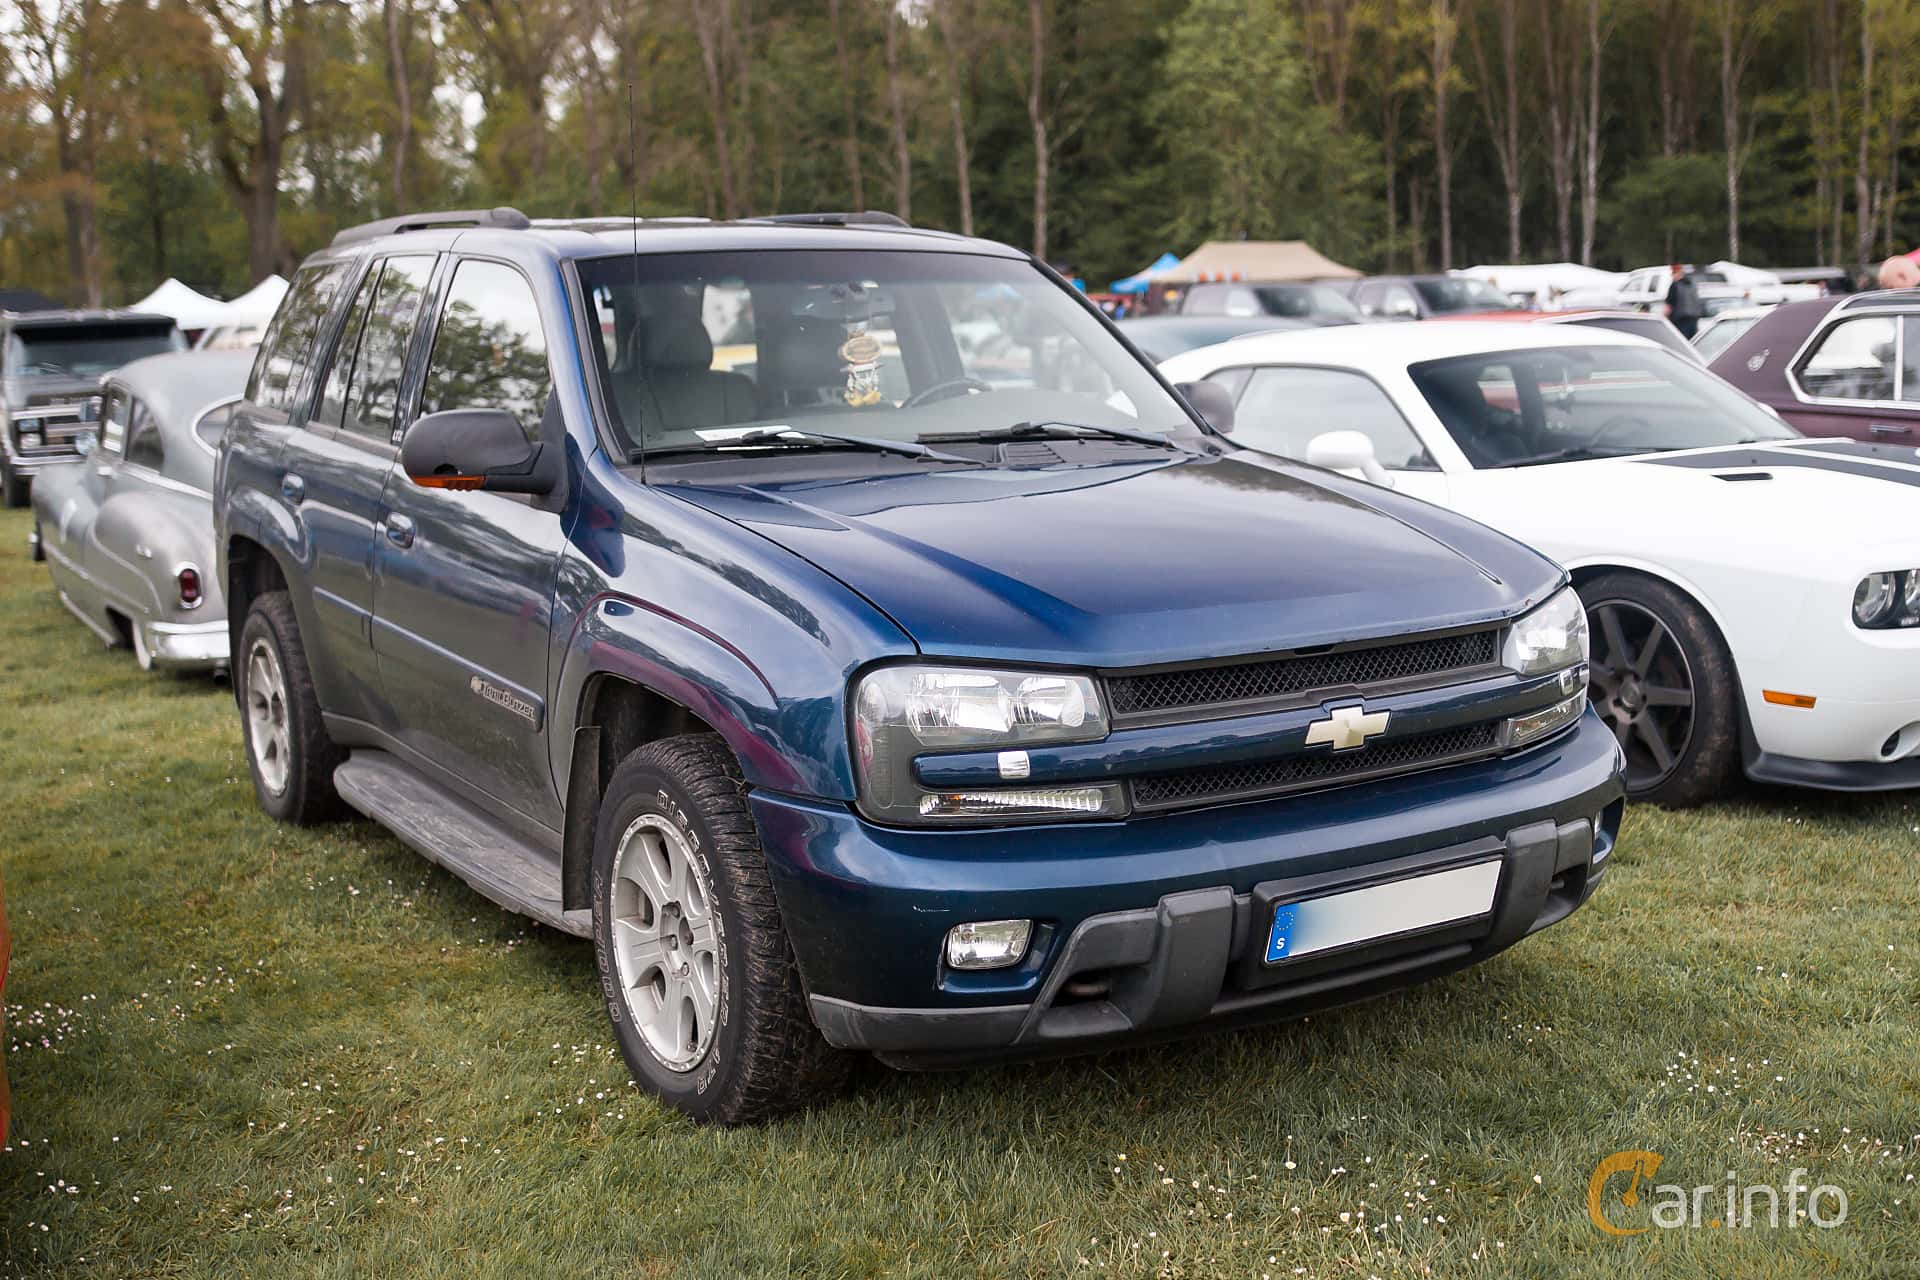 Chevrolet TrailBlazer 4.2 4WD Hydra-Matic, 273hp, 2002 at Hässleholm Power Start of Summer Meet 2015